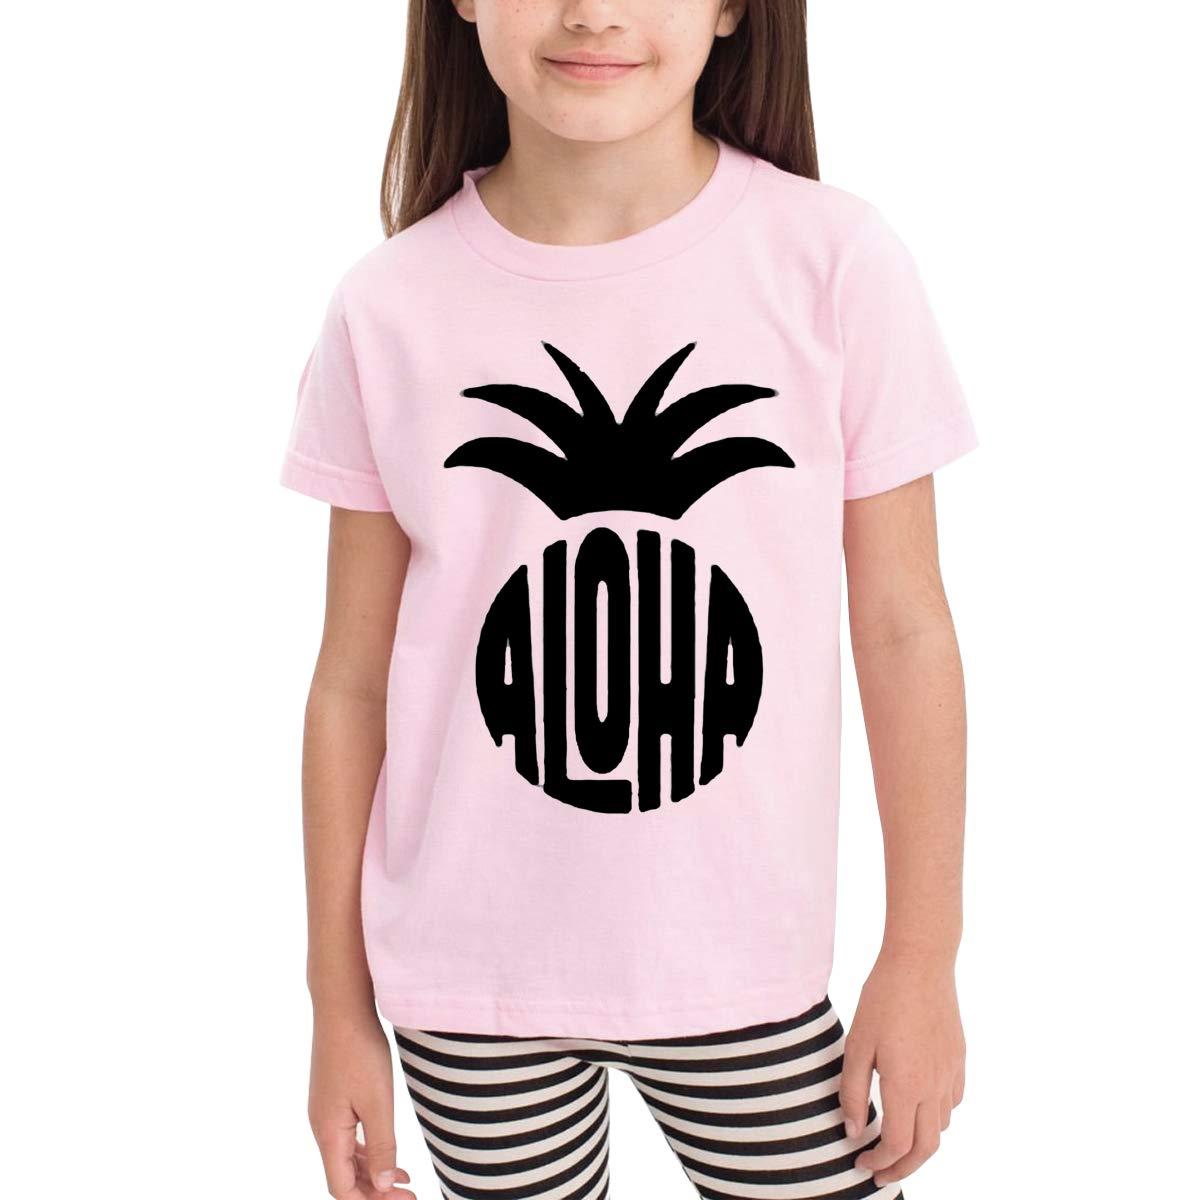 Aloha Pineapple 100/% Organic Cotton Toddler Baby Boys Girls Kids Short Sleeve T Shirt Top Tee Clothes 2-6 T